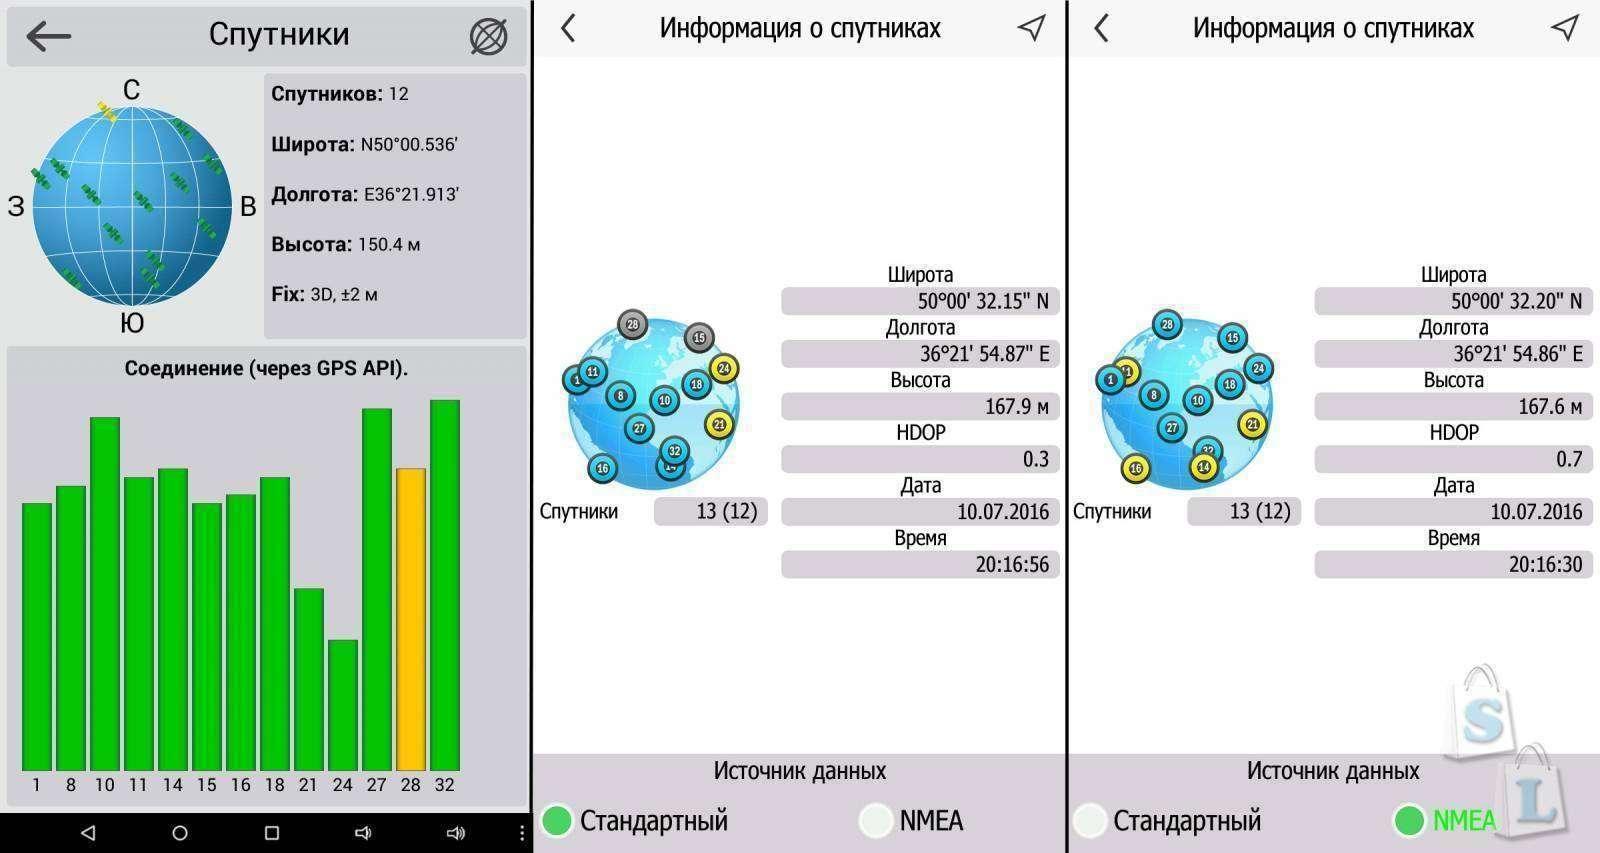 GearBest: CUBE U27GT, небольшой Андроид планшет